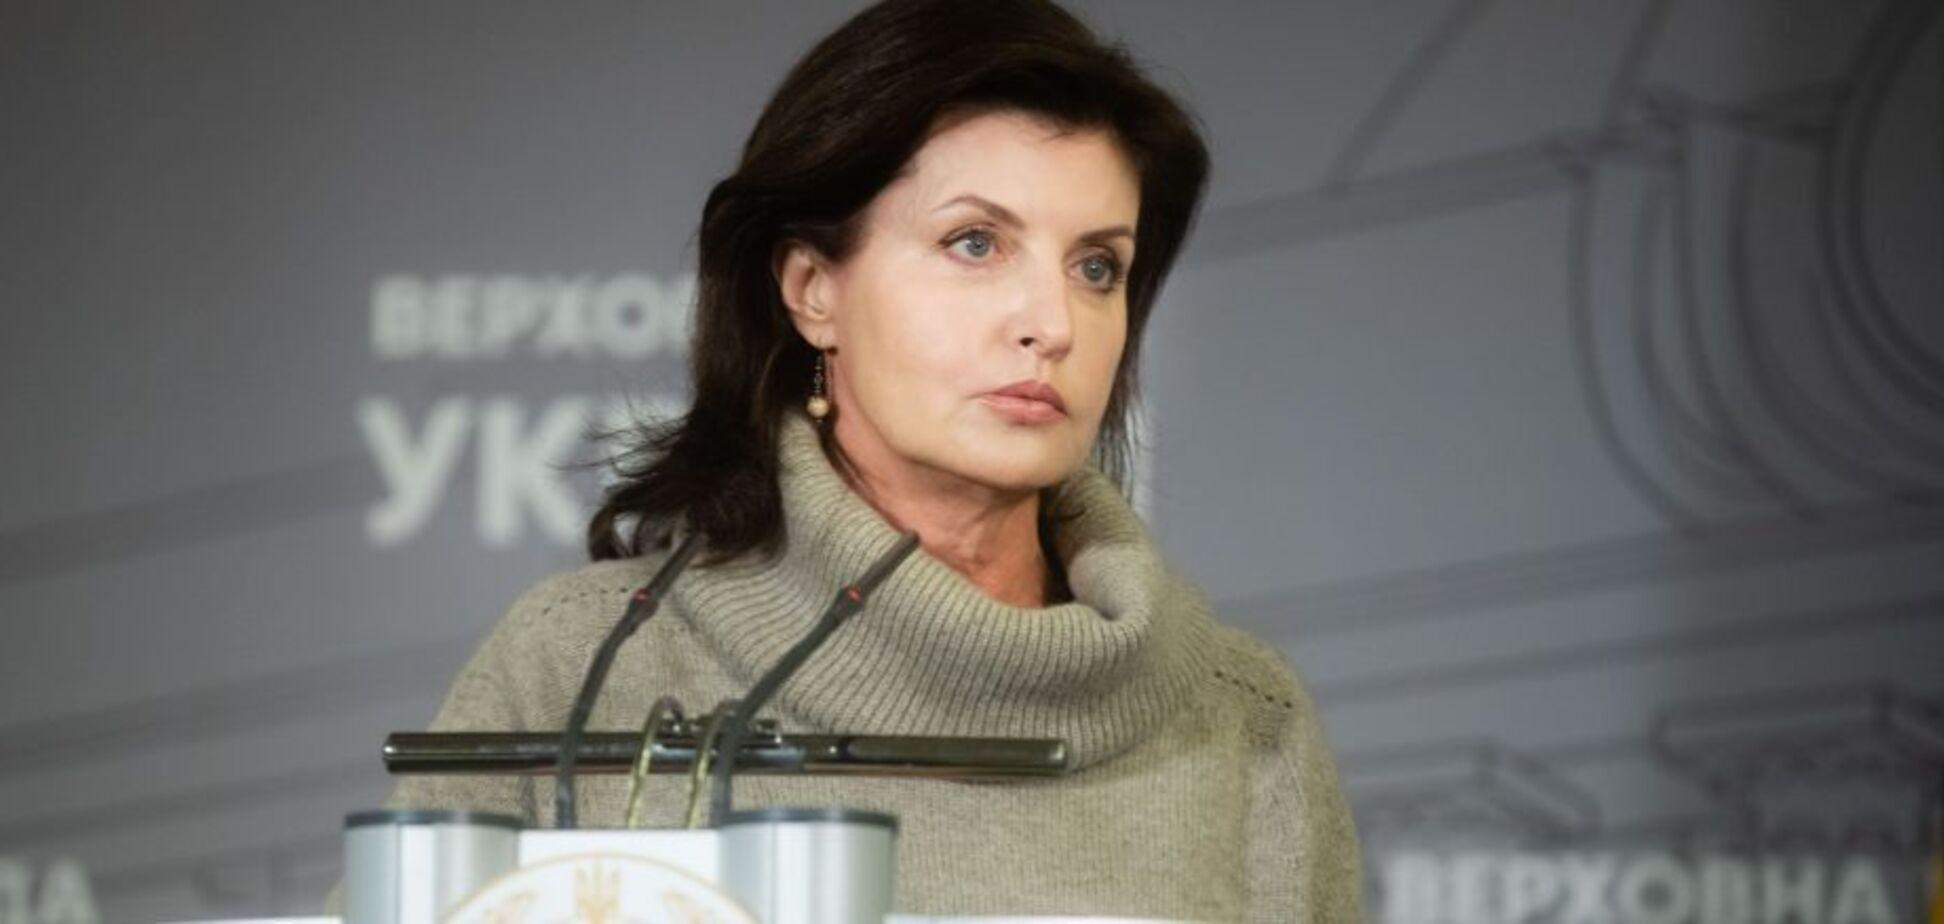 Марина Порошенко про 8 березня: нам давно пора зламати стереотипи